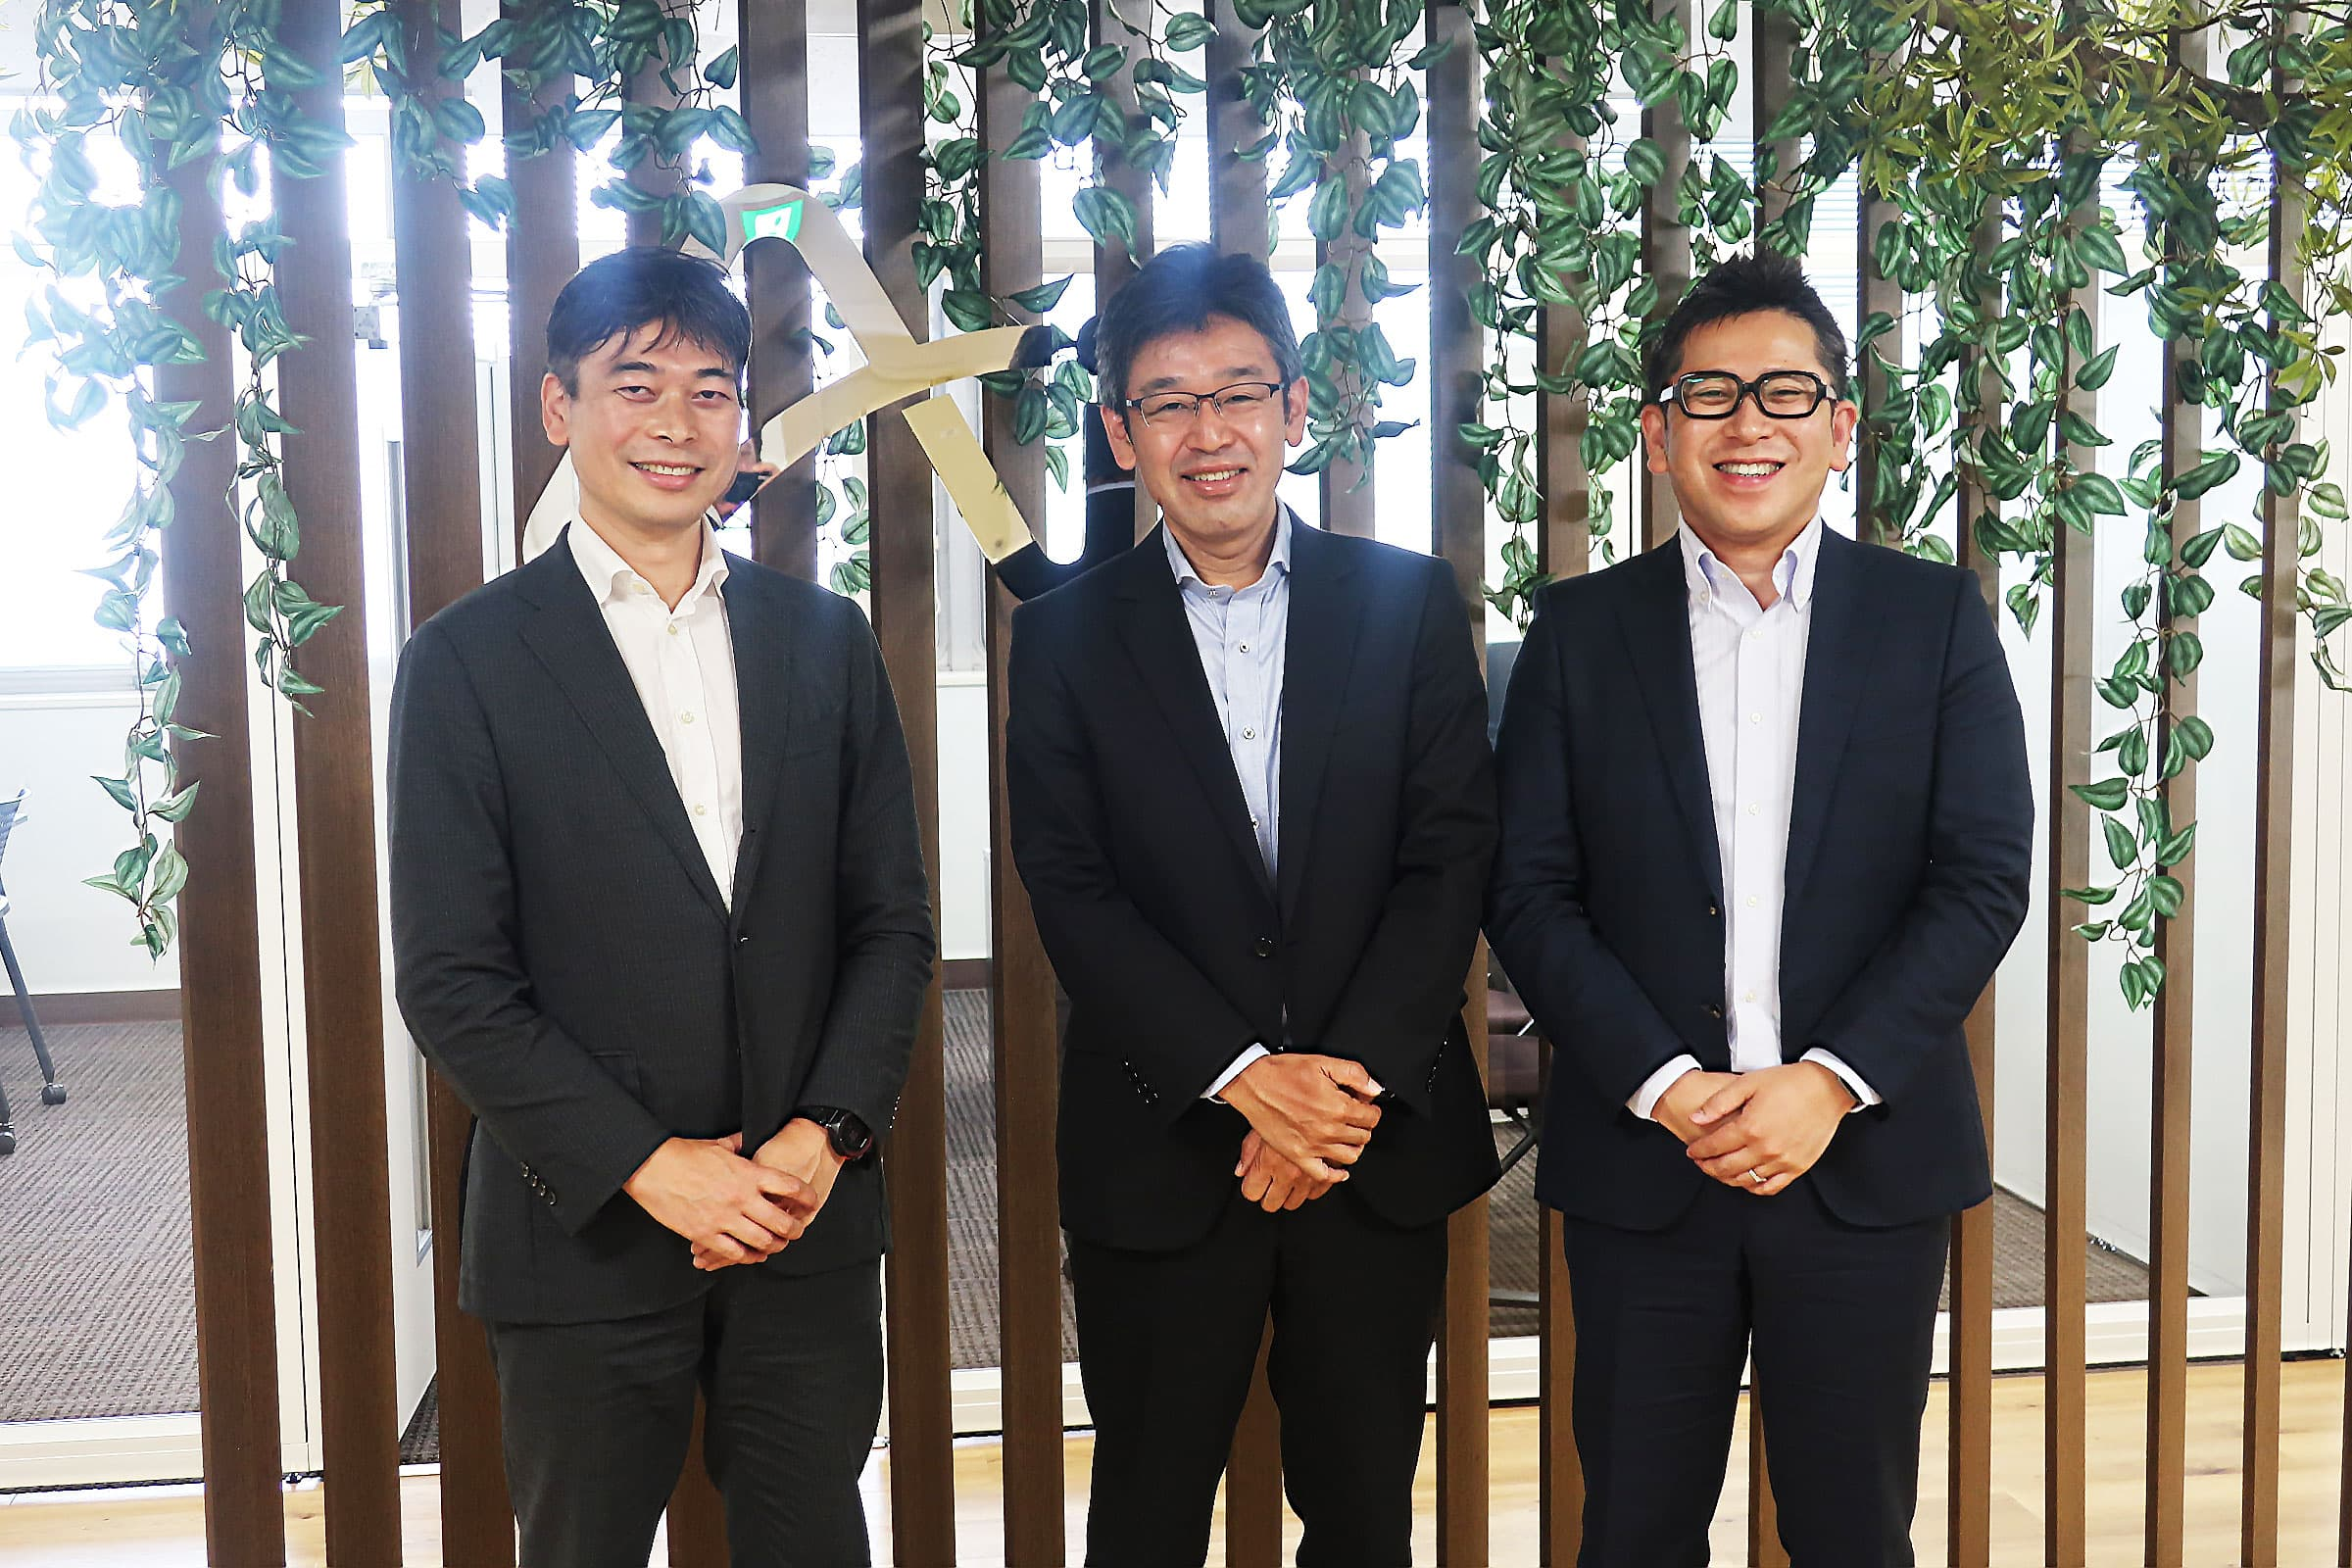 Beyond AI 研究推進機構にて、左から東京大学 田中謙司准教授、ソフトバンク松田慎一氏、同 國枝良氏